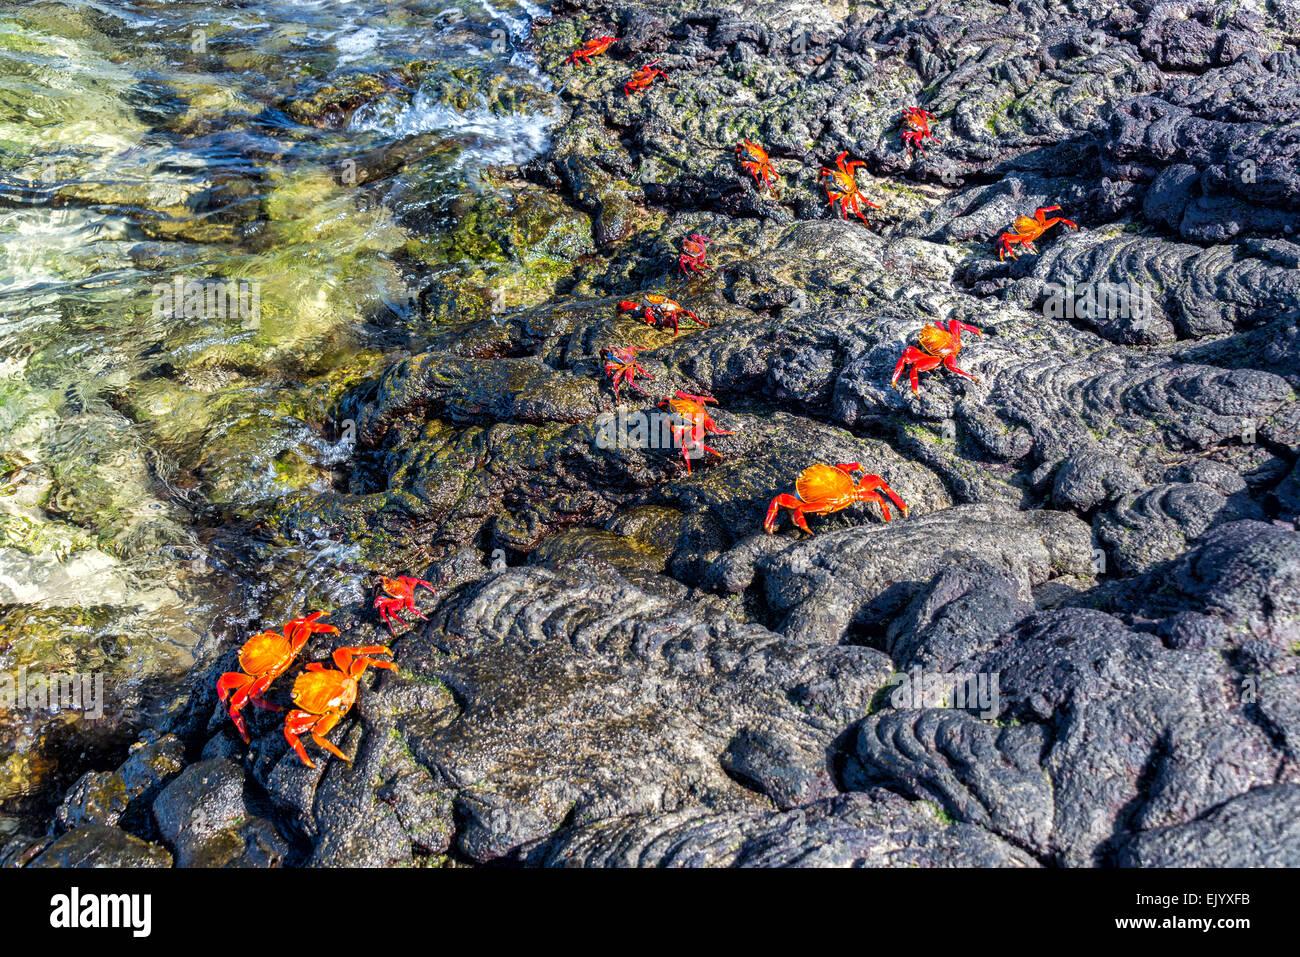 Lightfoot crabs on volcanic rock on Santiago Island in the Galapagos Islands in Ecuador - Stock Image